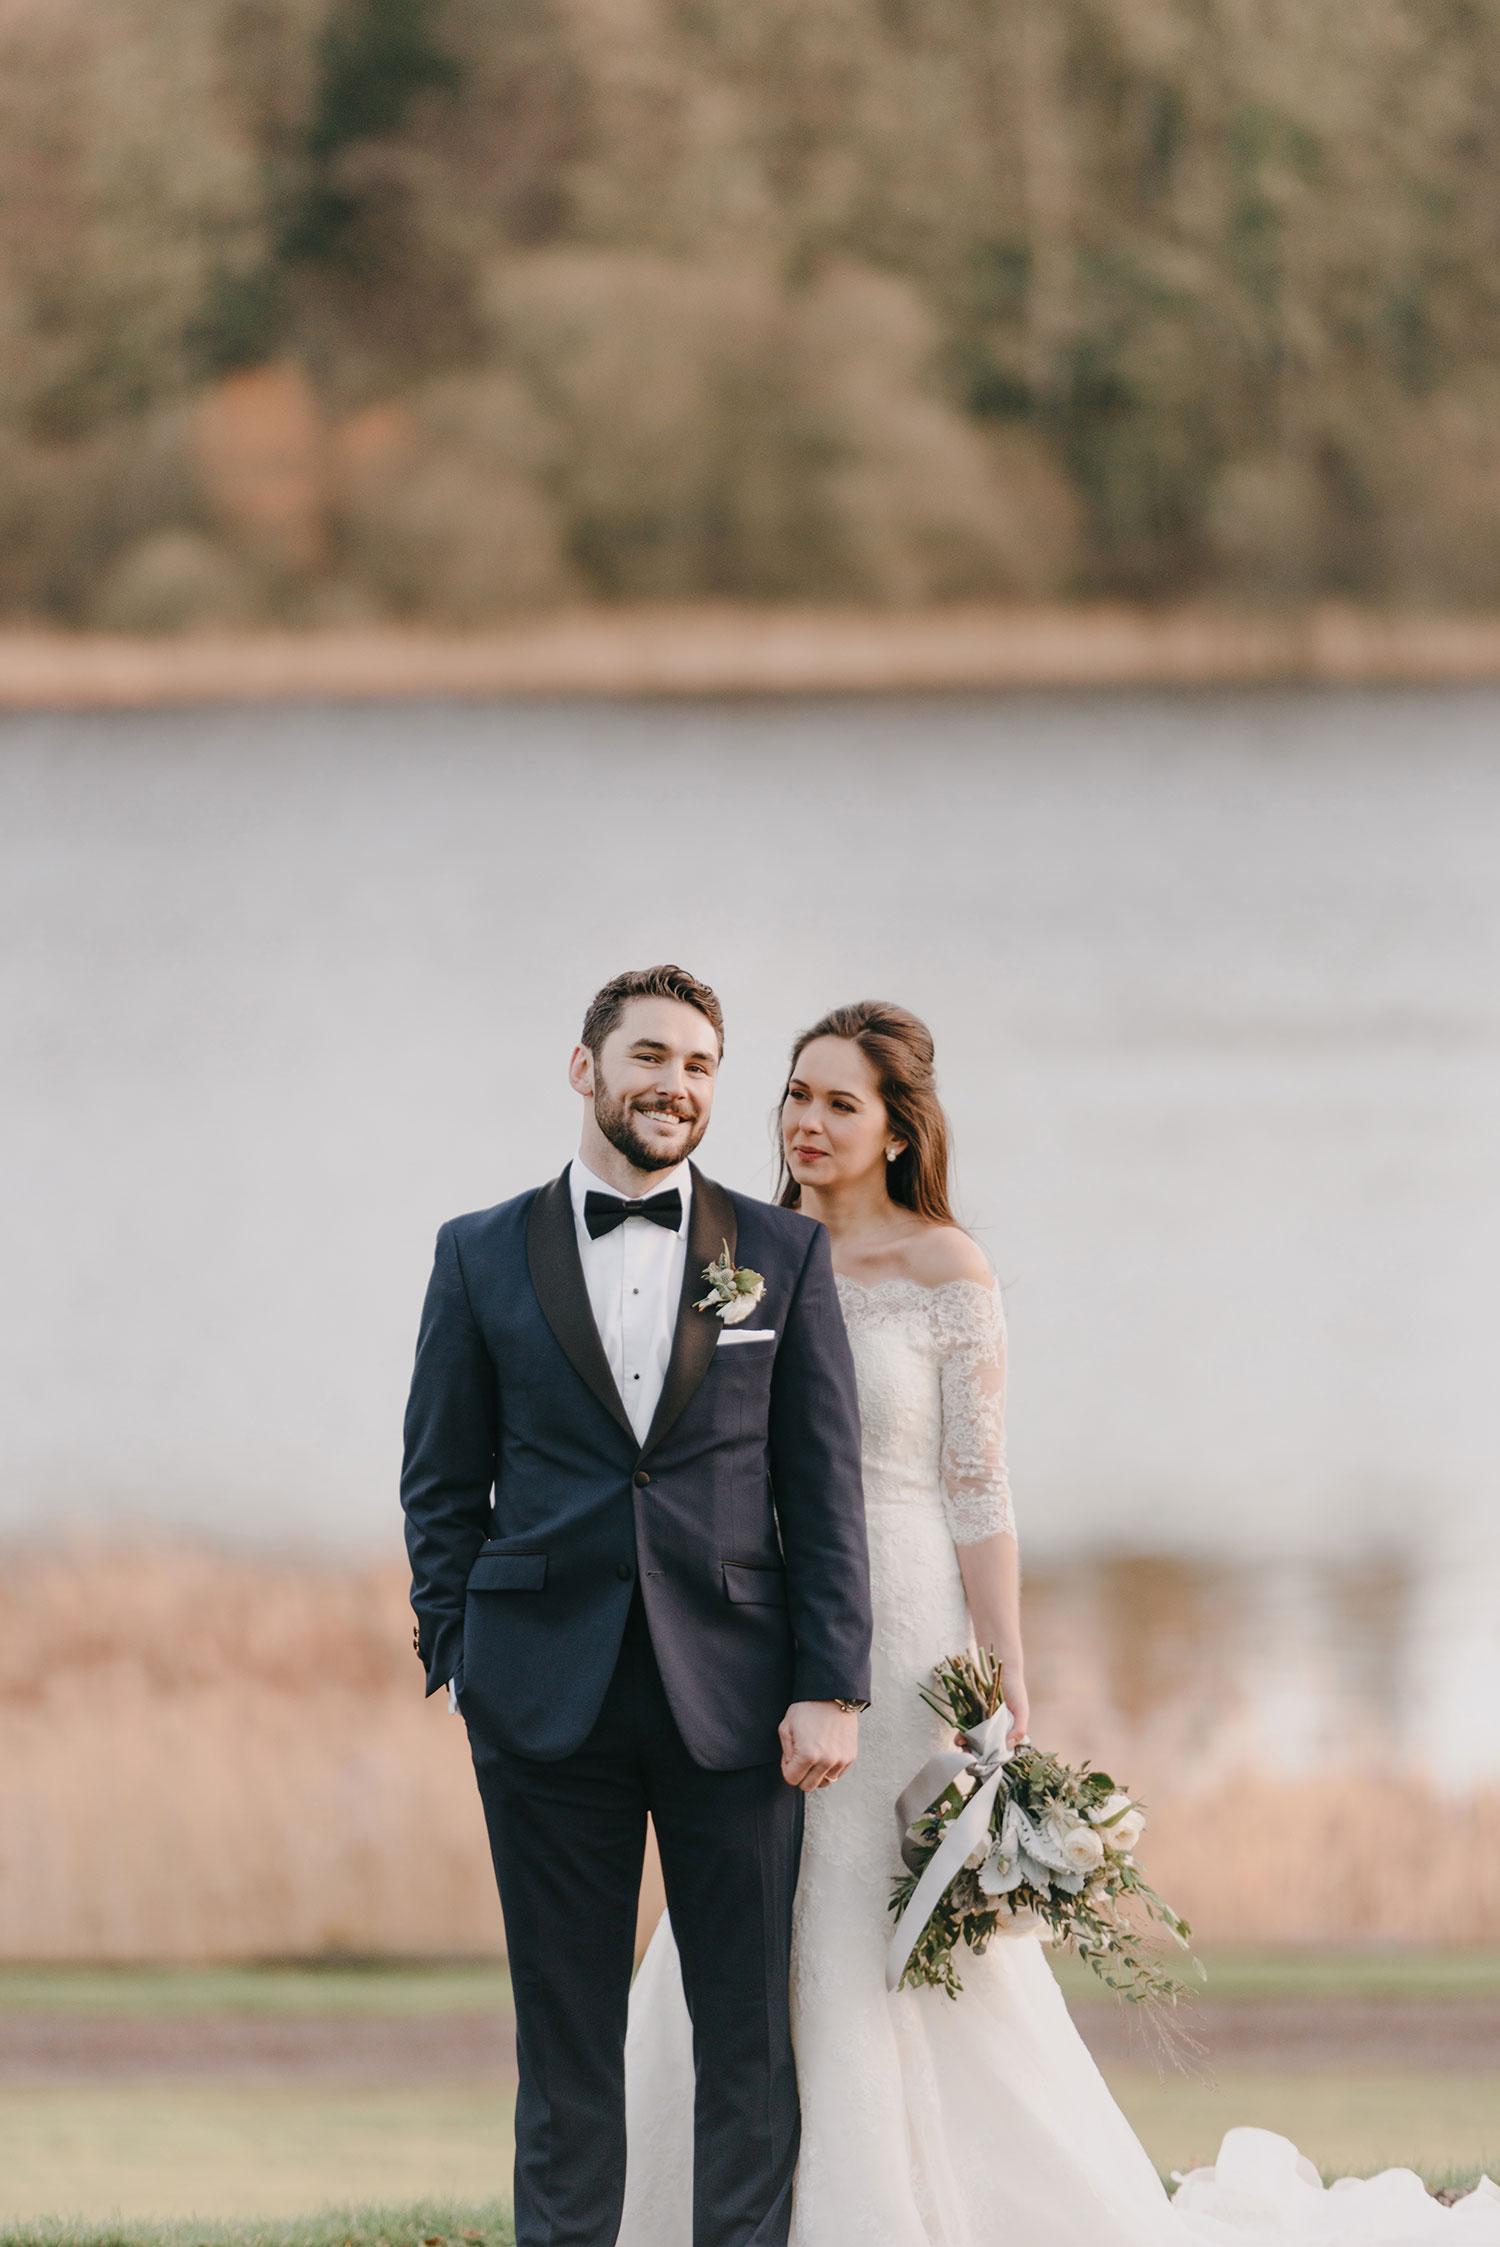 castle-leslie-wedding-photographer-ireland-095.jpg